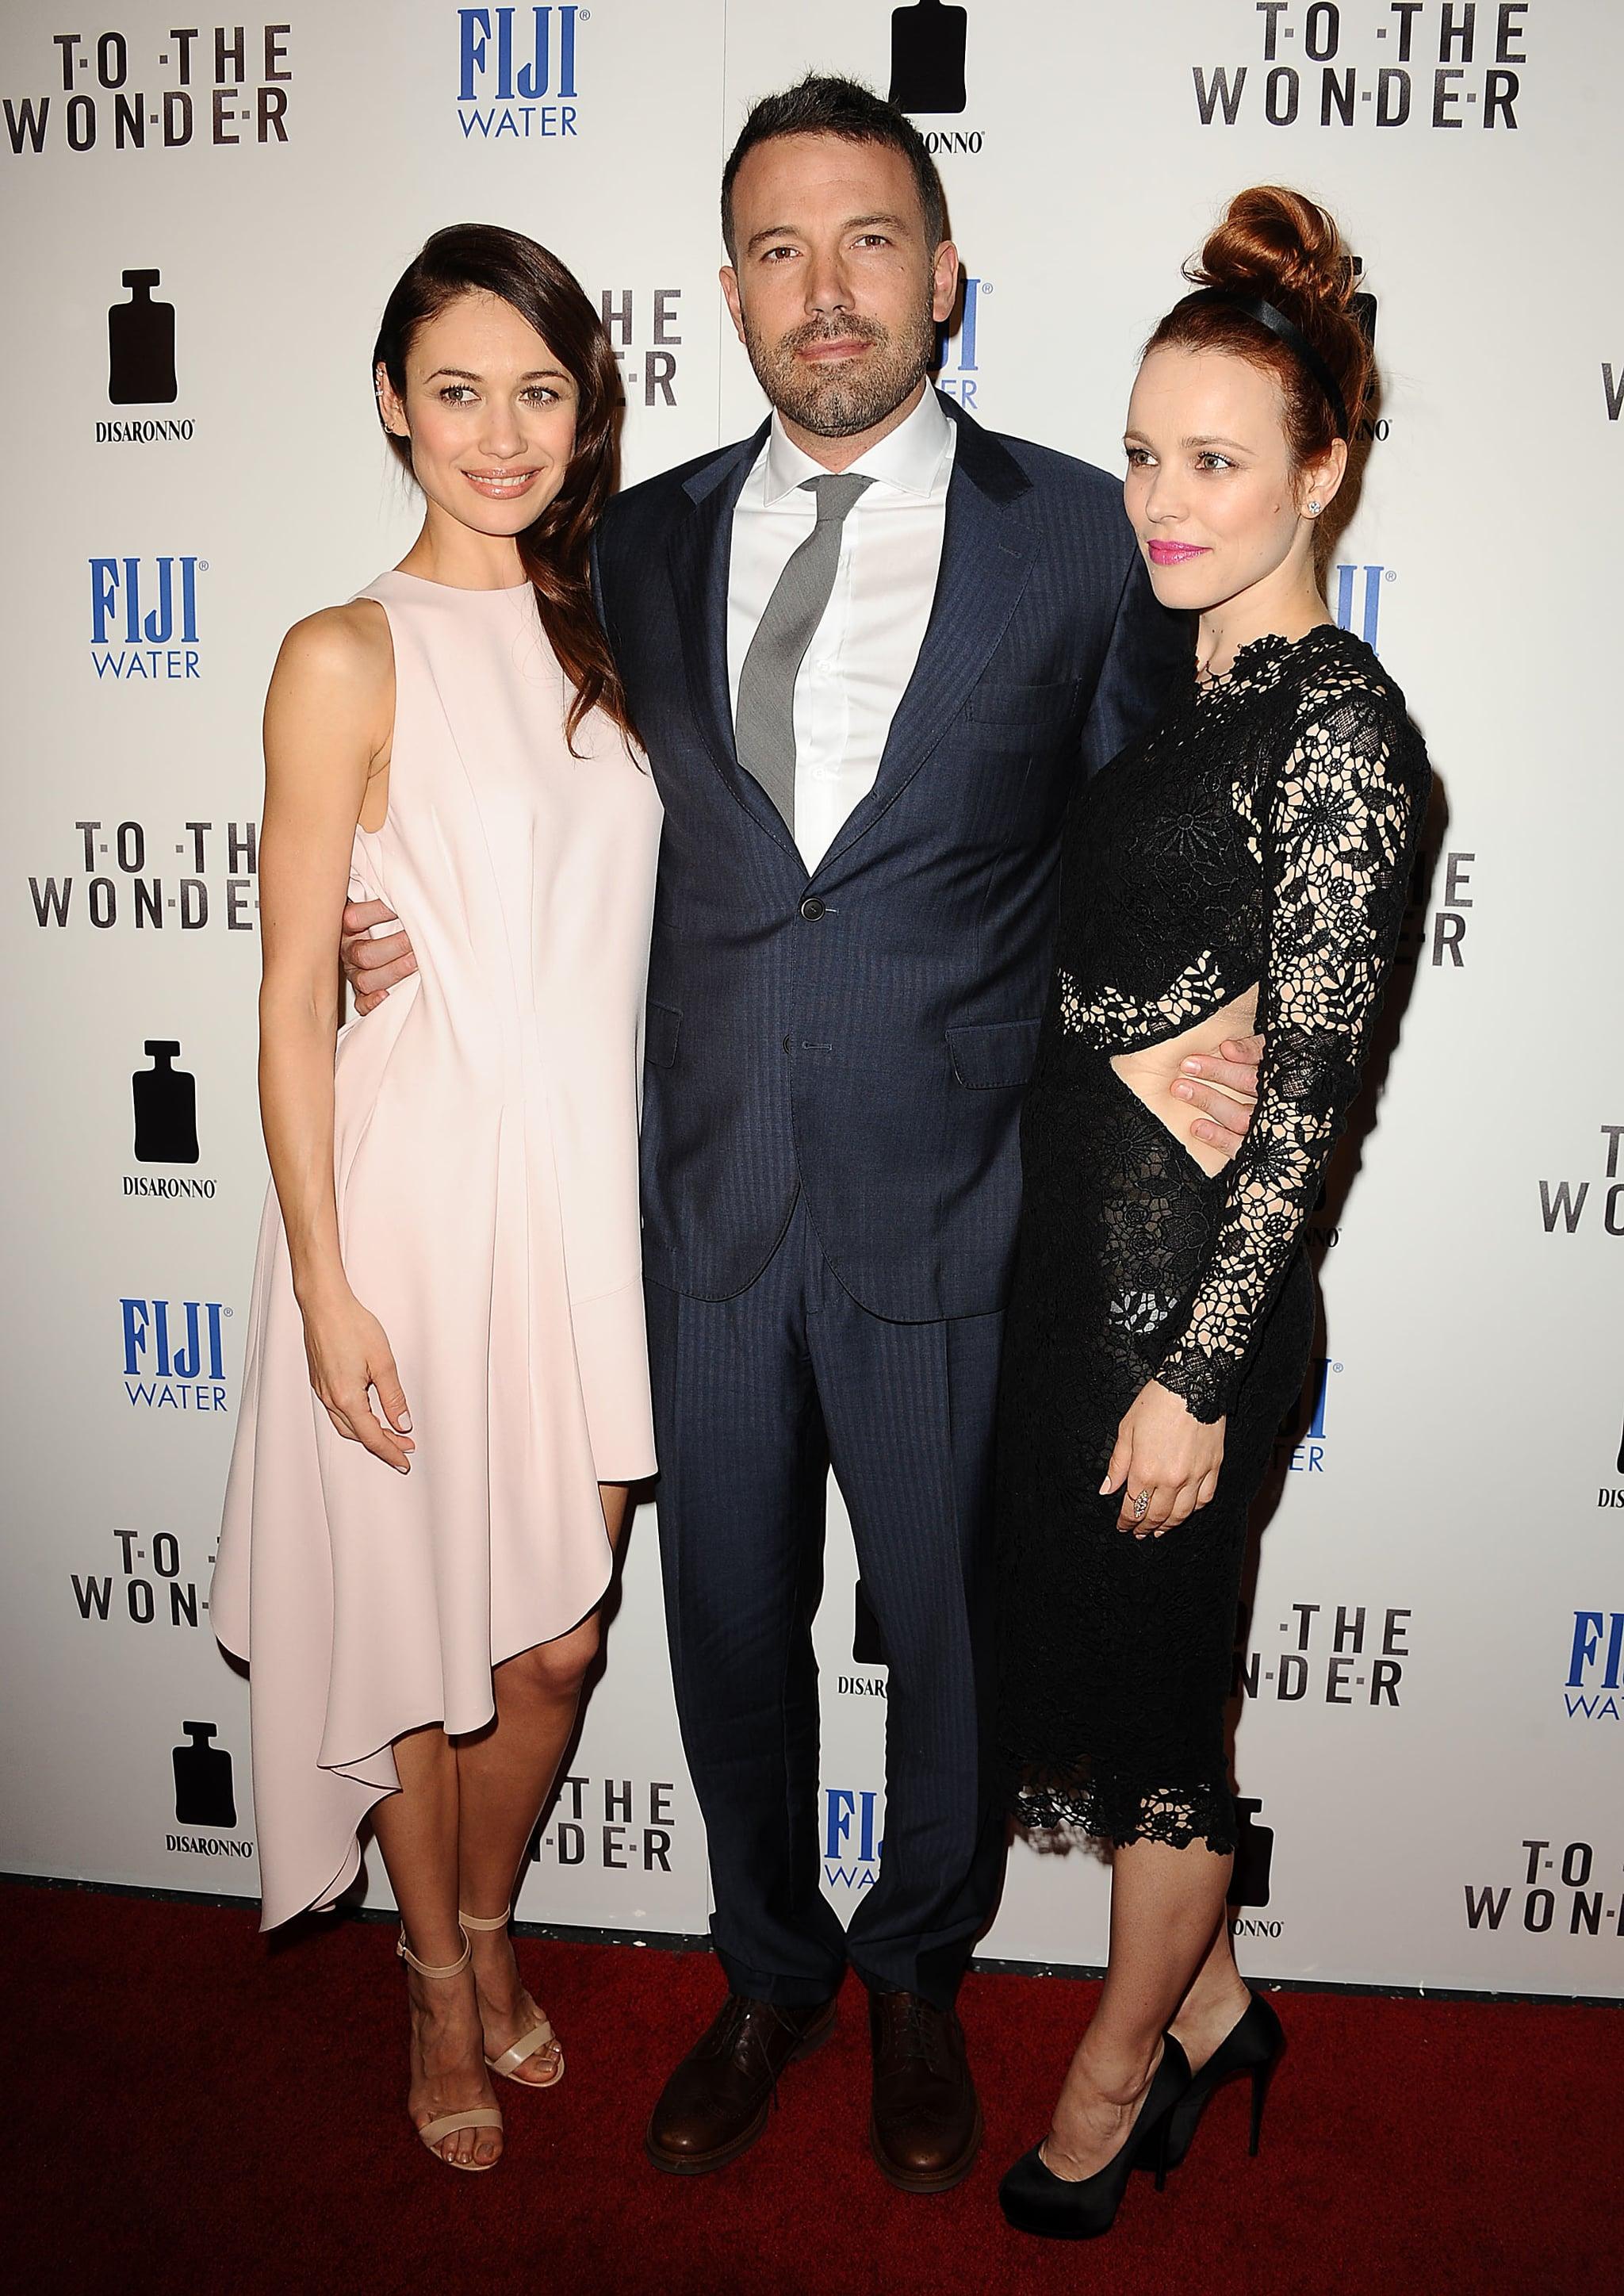 Rachel McAdams, Ben Affleck, and Olga Kurylenko posed together at the event, sponsored by DISARONNO and FIJI Water.